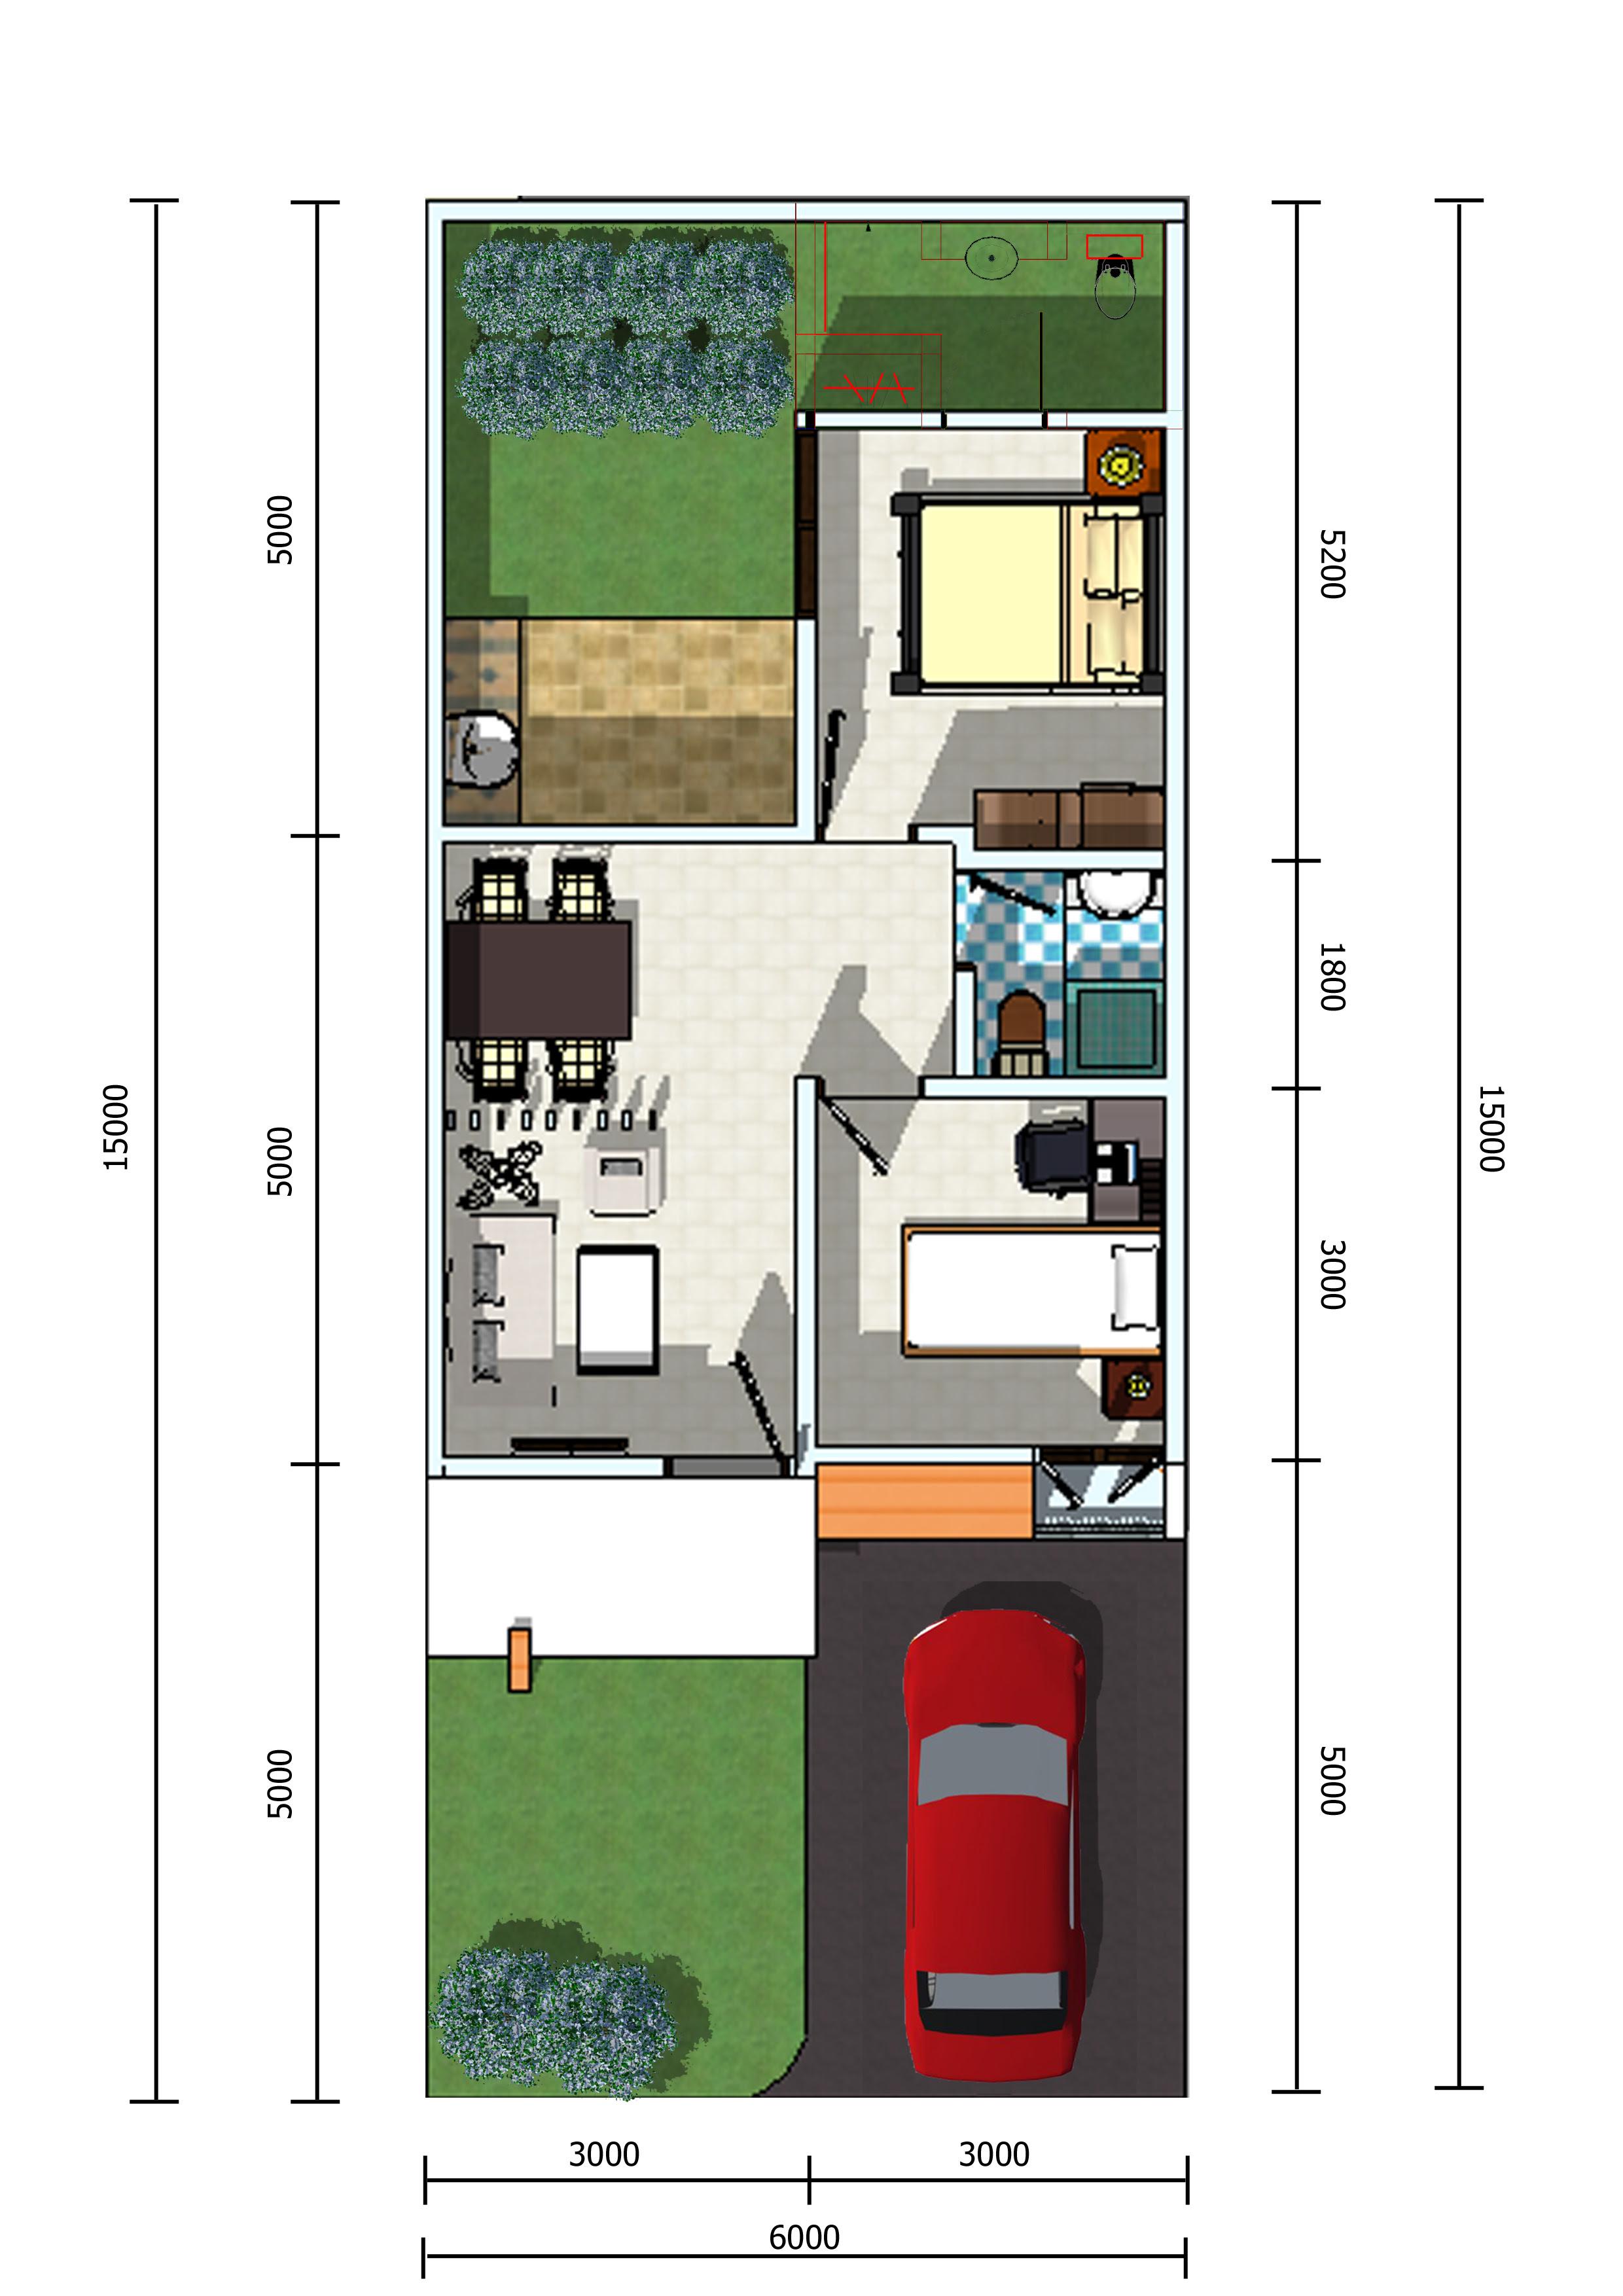 Kumpulan Desain Rumah Minimalis Ukuran 5x12 Kumpulan Desain Rumah